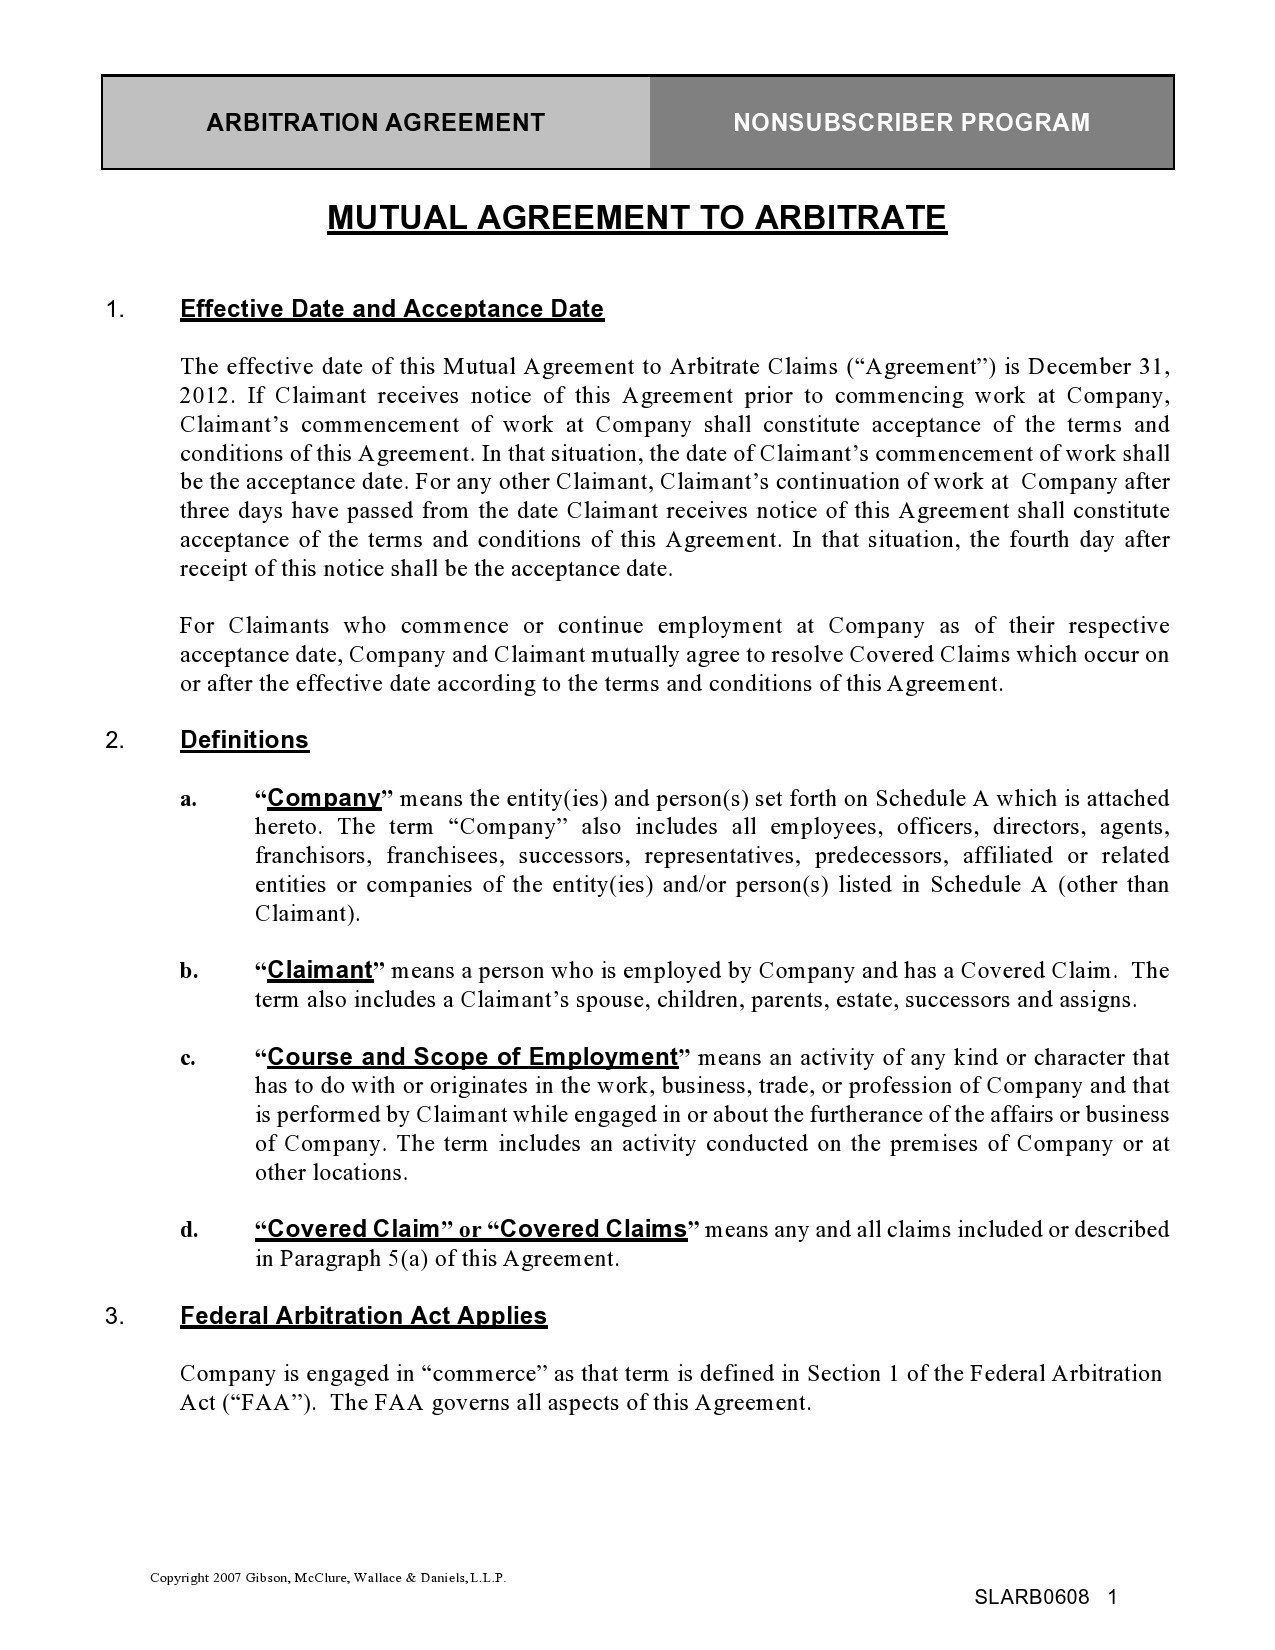 Free arbitration agreement 16